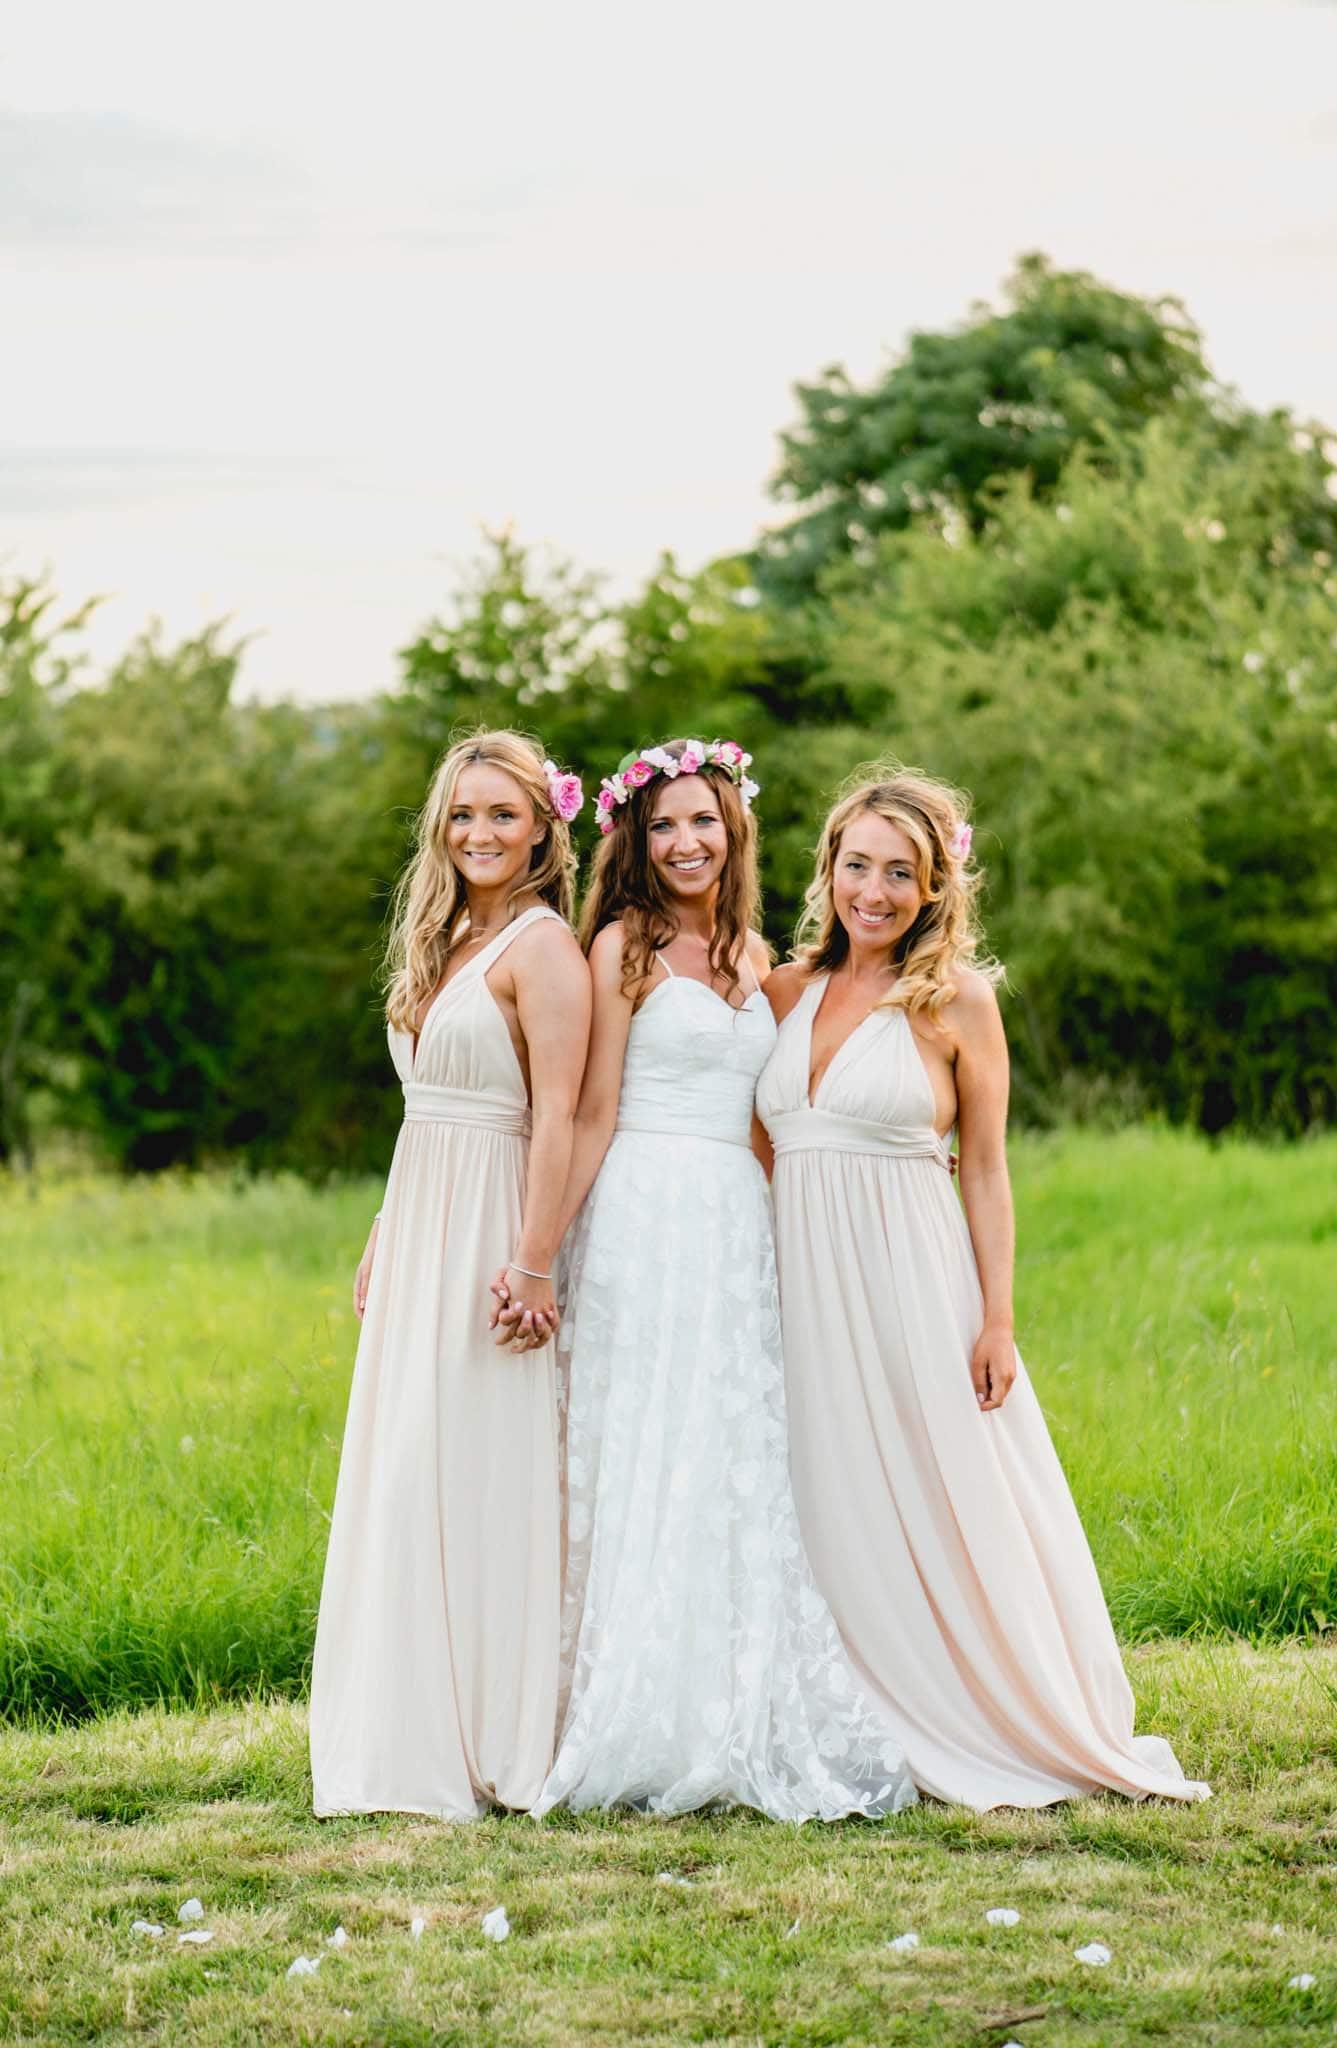 wedding photo at The Bond Company,Birmingham by West Midlands Wedding photographer Lisa Carpenter Photography